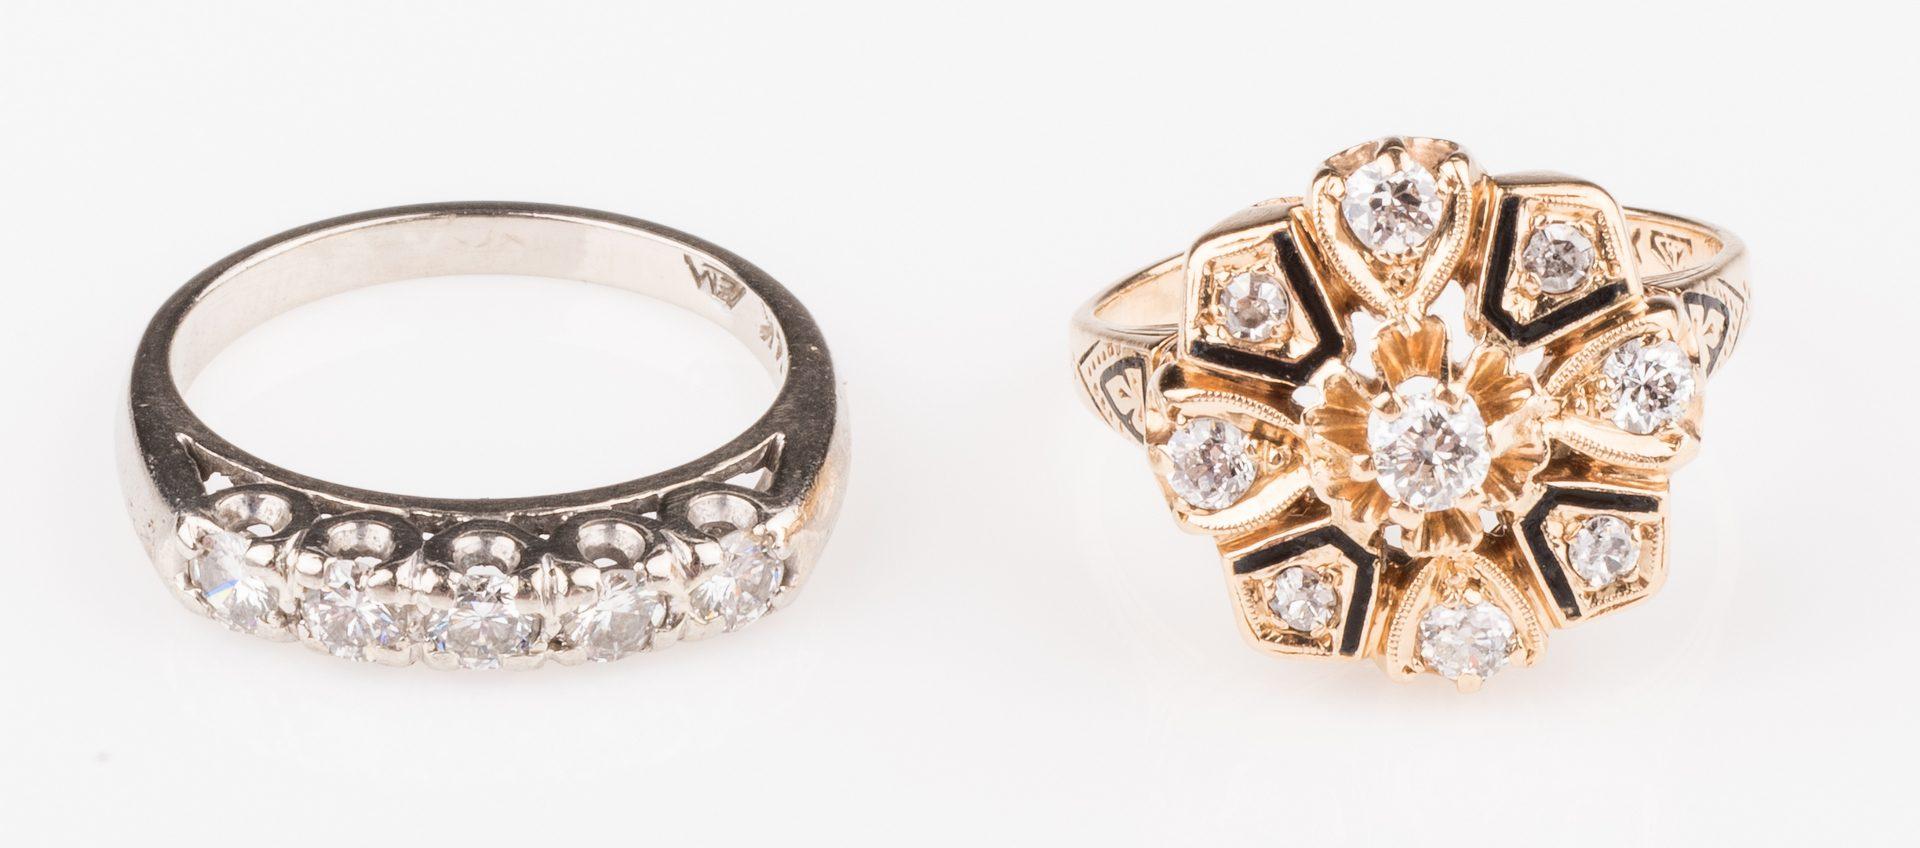 Lot 678: Two 14K Vintage Diamond Rings